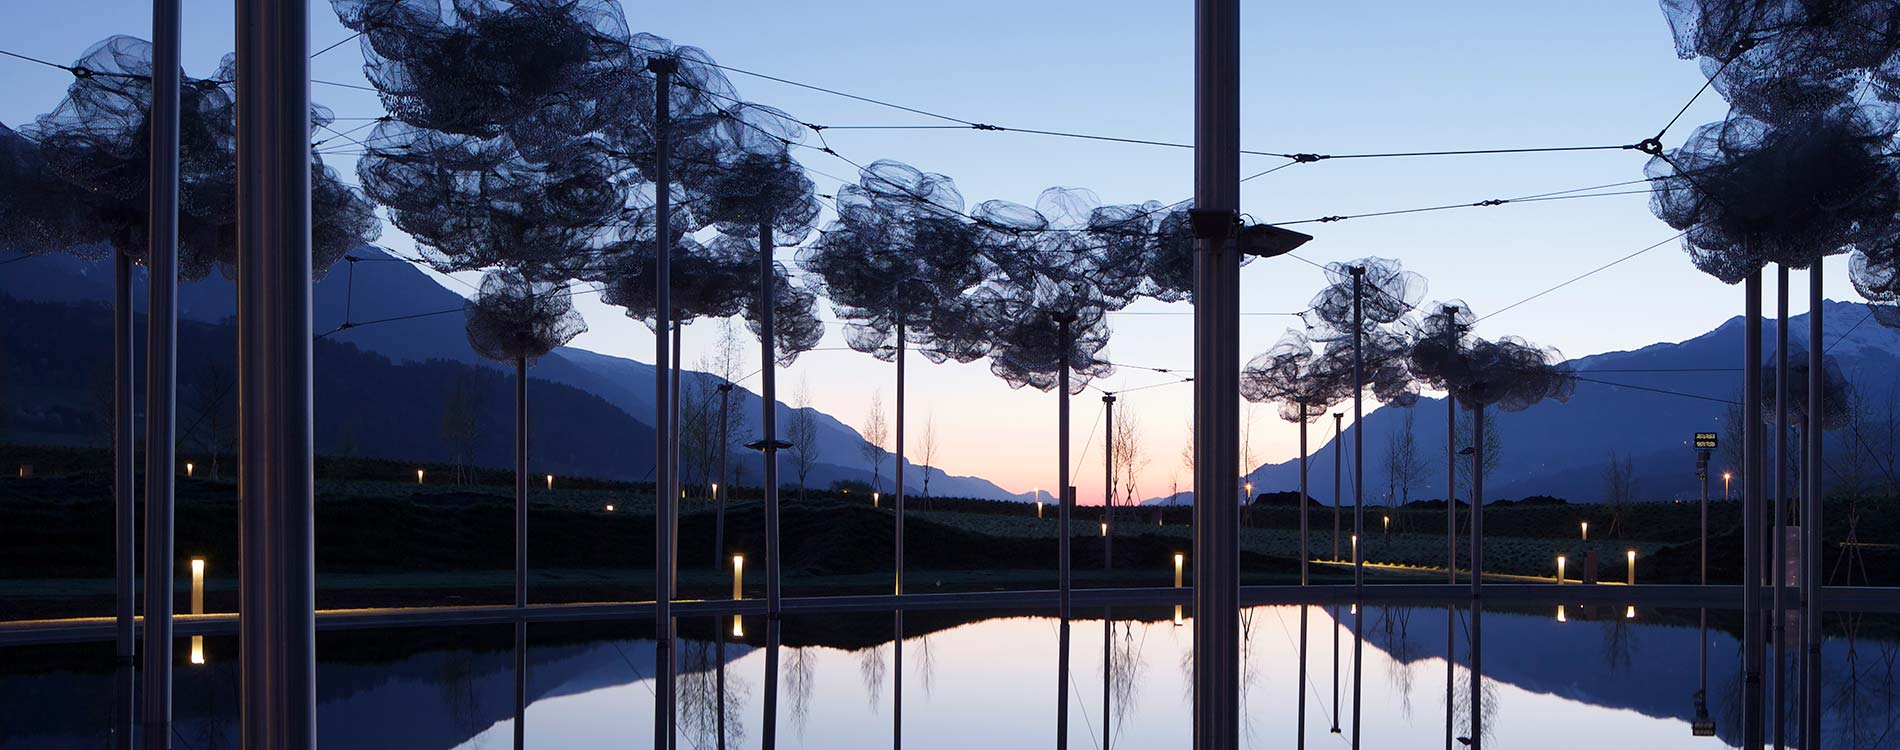 Experience Swarovski Crystal Worlds with Niche Destinations